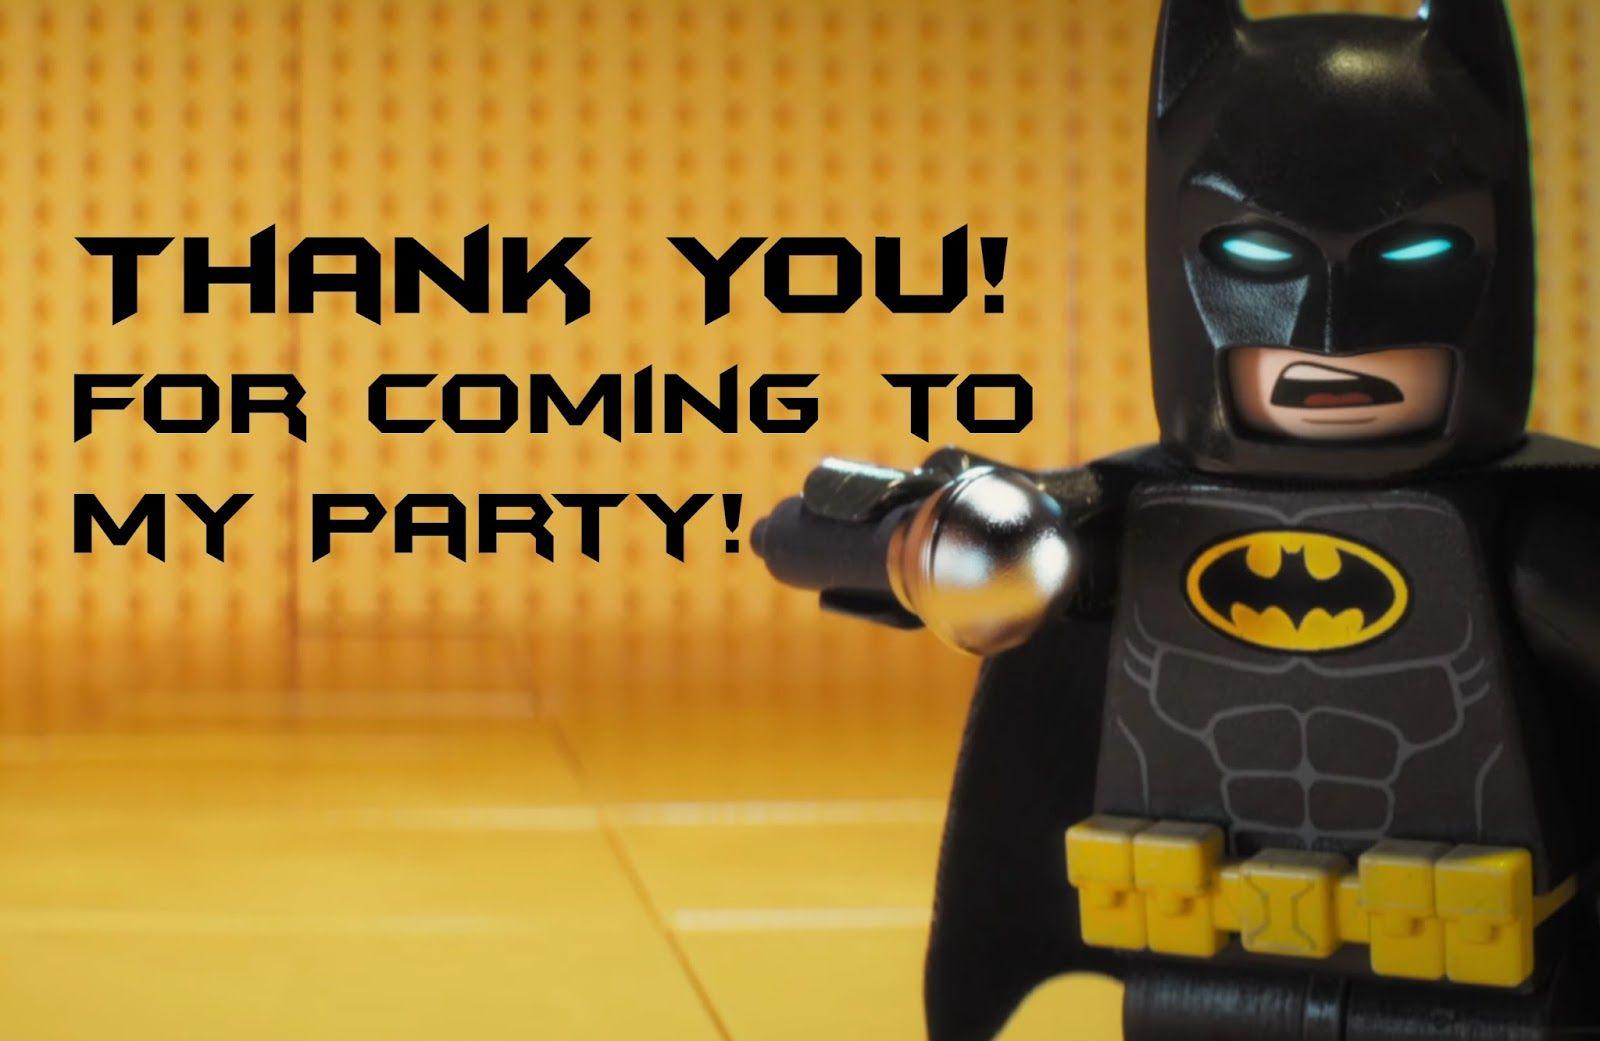 Lego Batman Thank You Cards | Lego Batman-Super Heros Printables - Lego Batman Invitations Free Printable